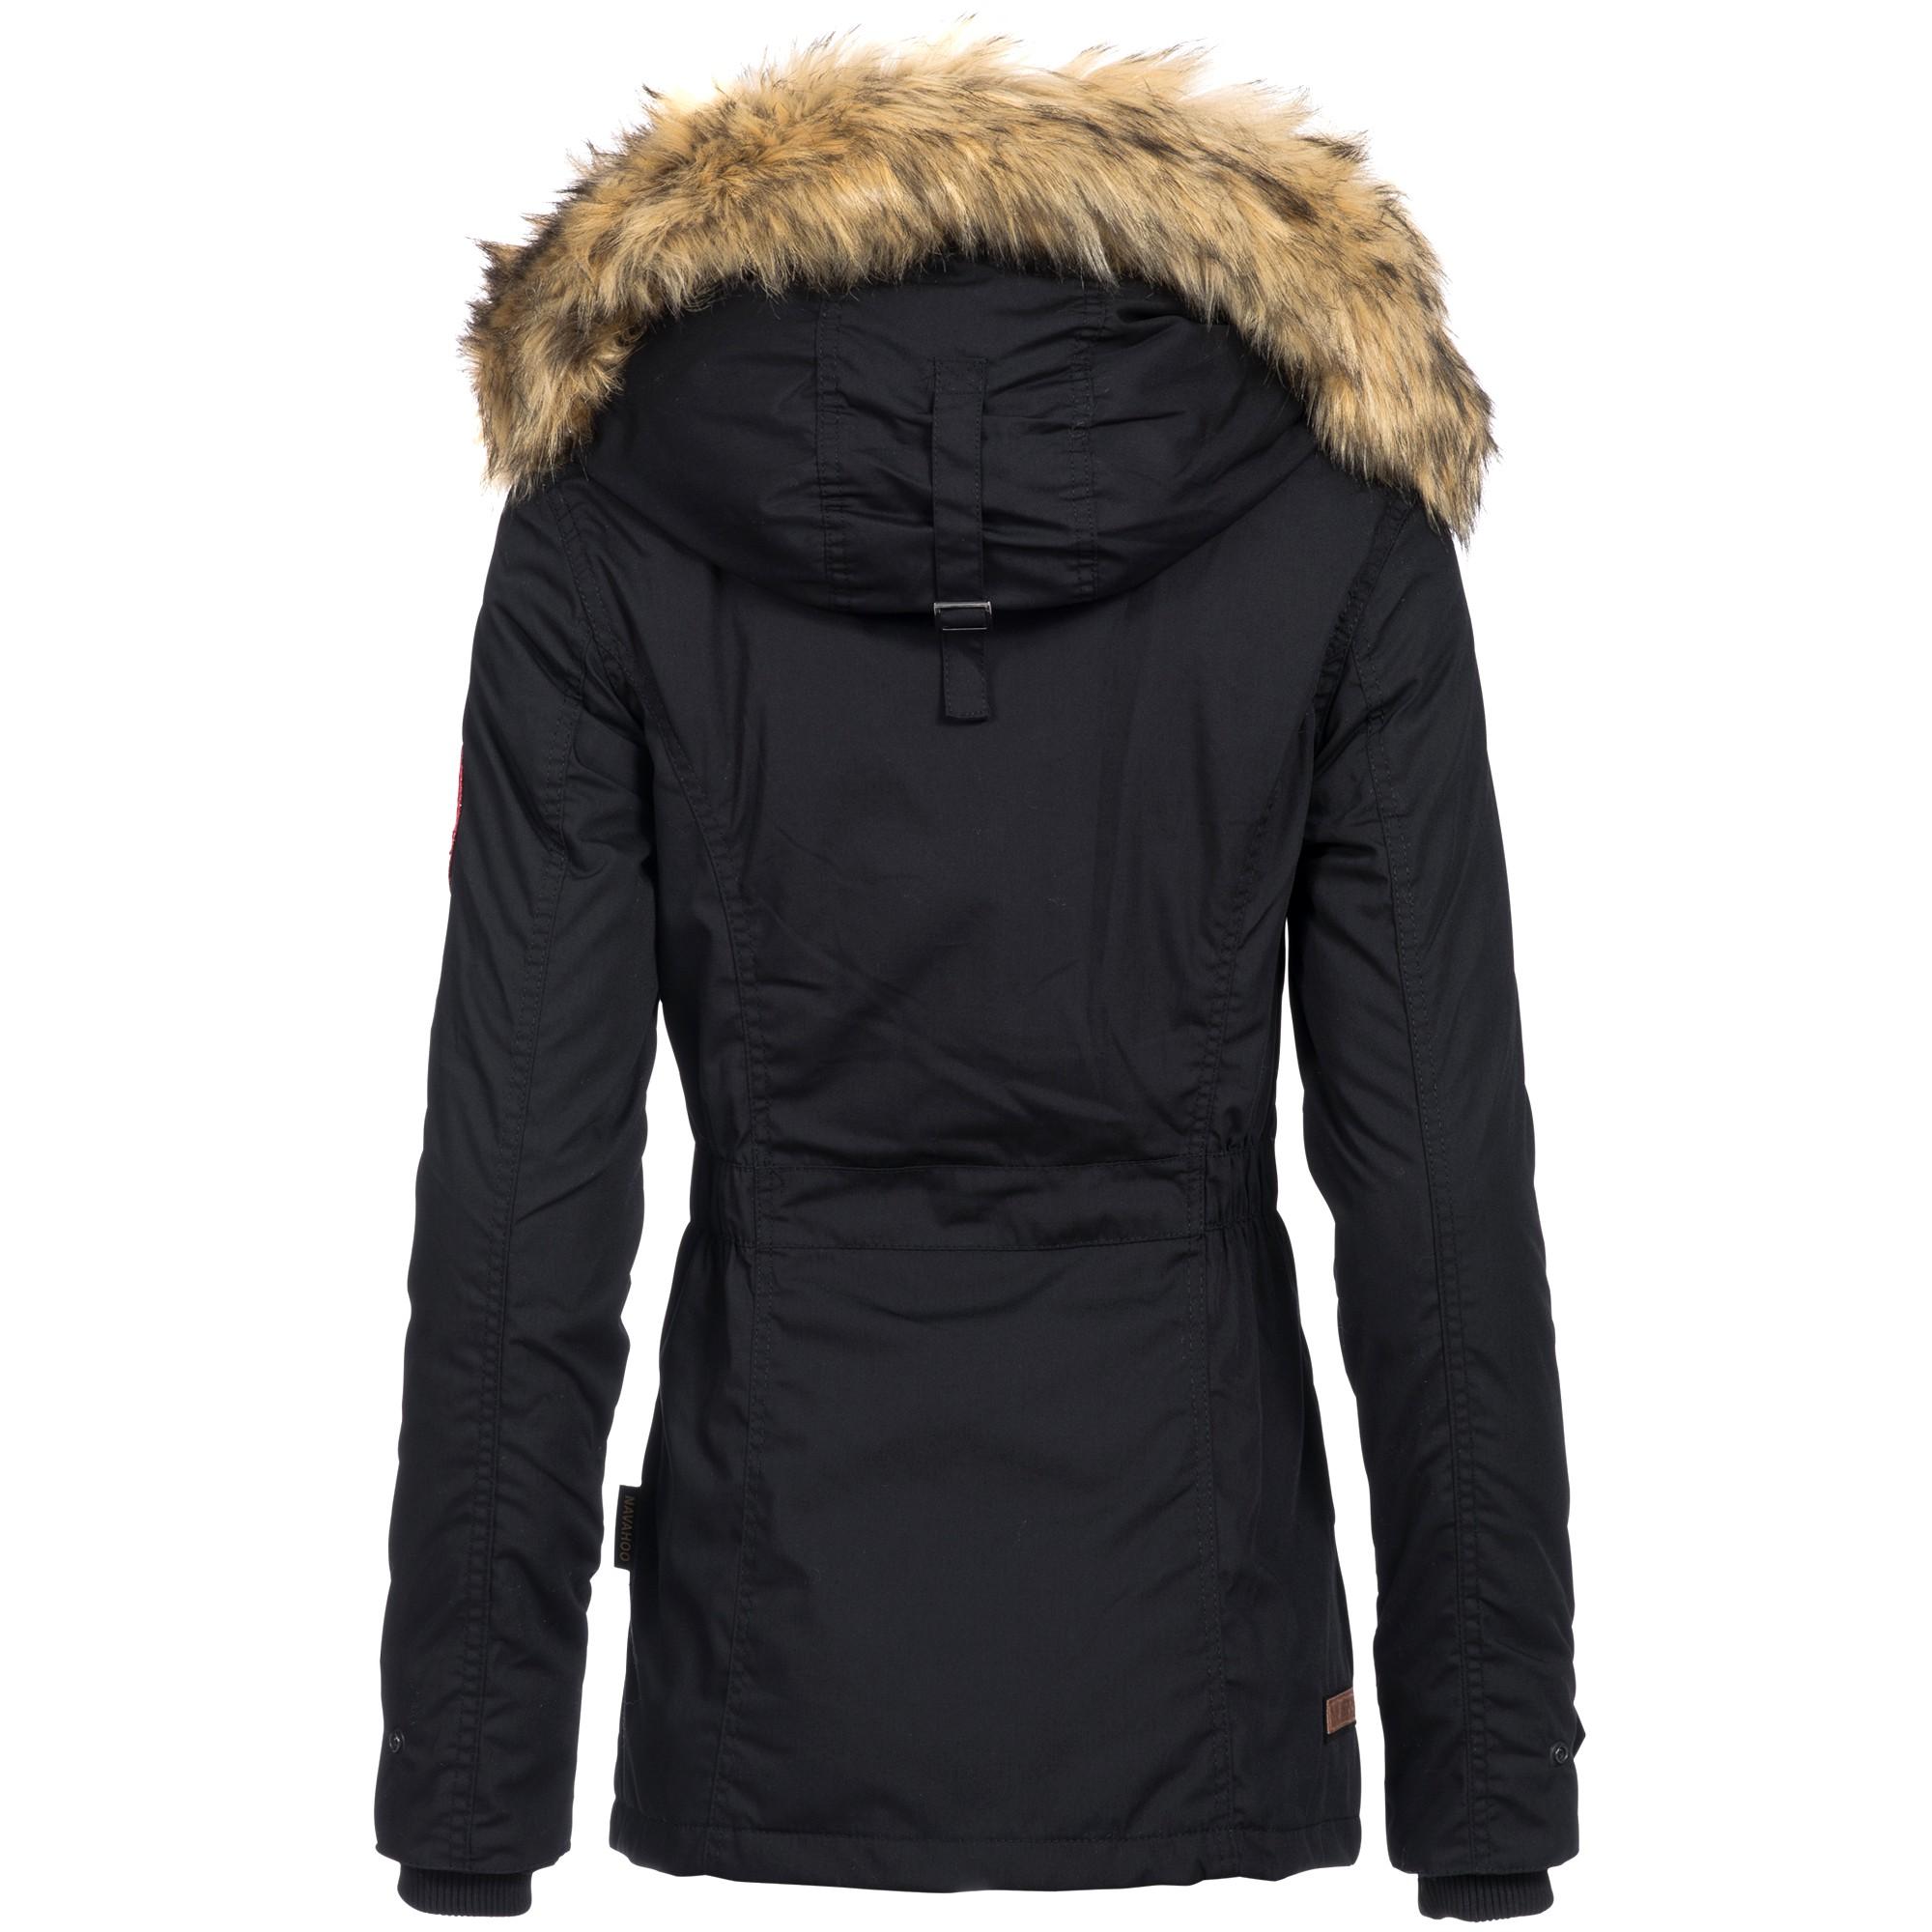 957789e70bdd8a Navahoo LAURA Damen Jacke Parka Mantel Winterjacke Kapuze super warm ...